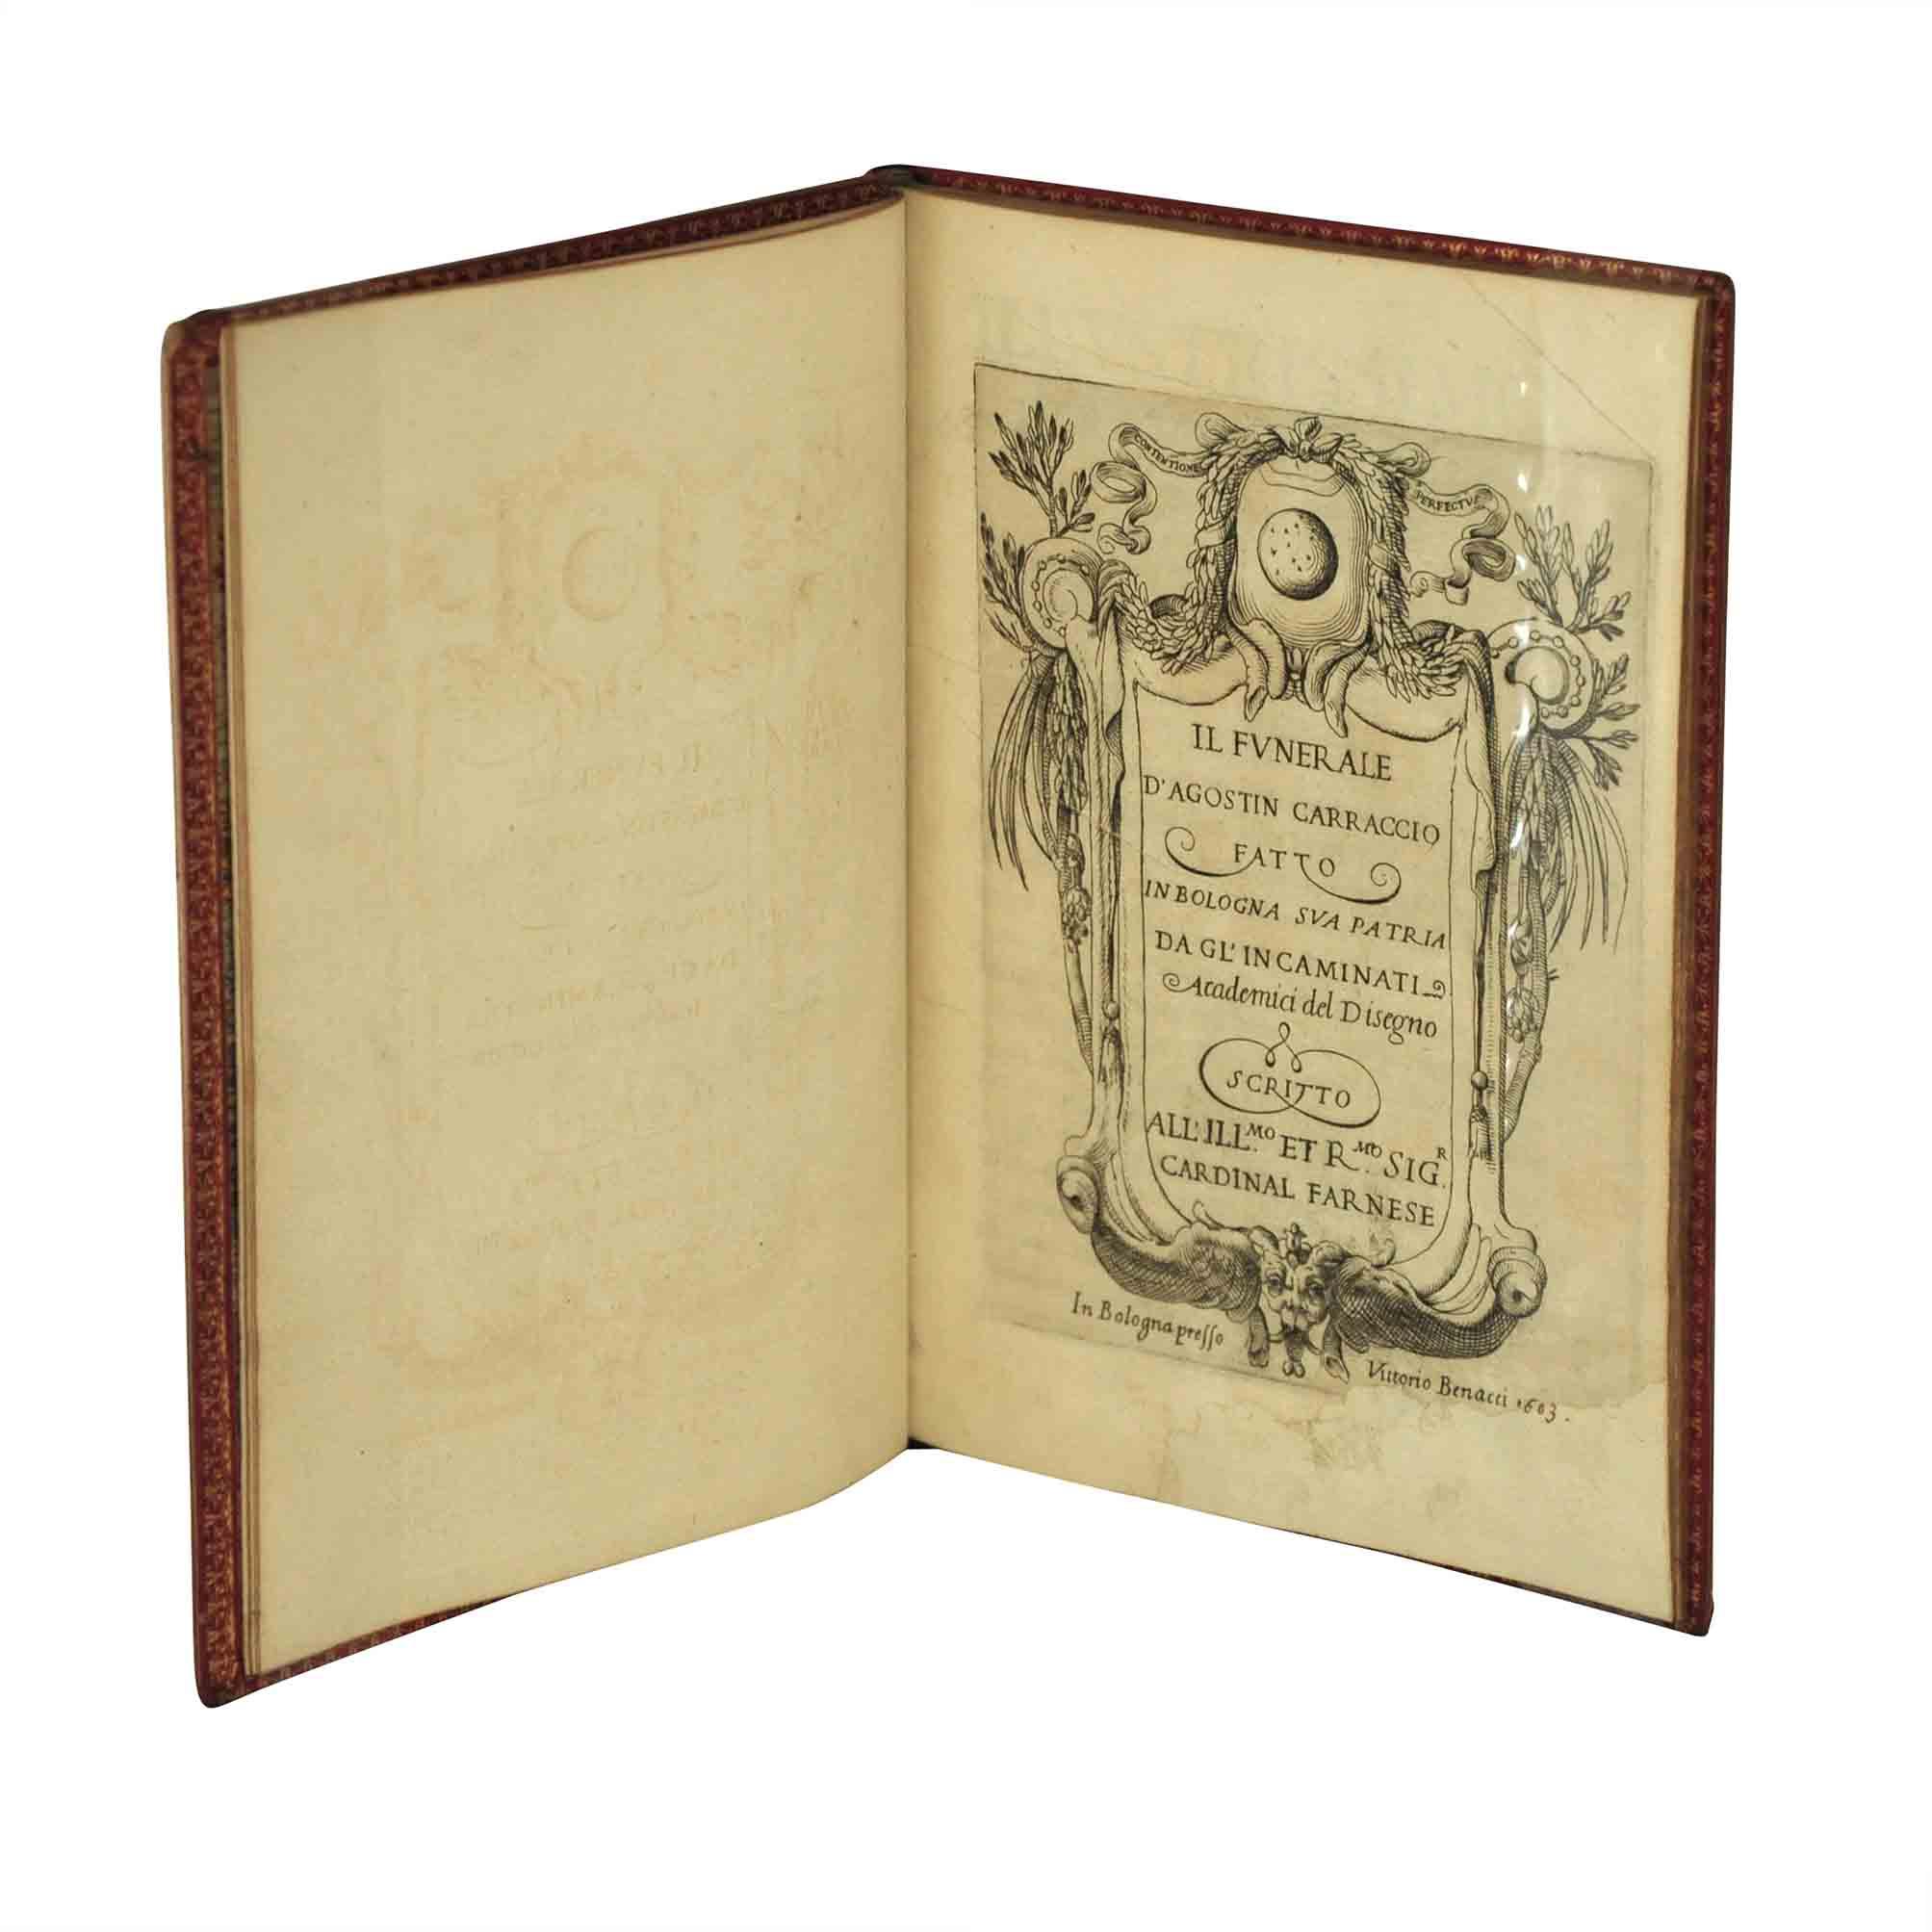 5563-Reni-Funerale-Carracci-1603-Title-Engraving-Etching-N.jpg